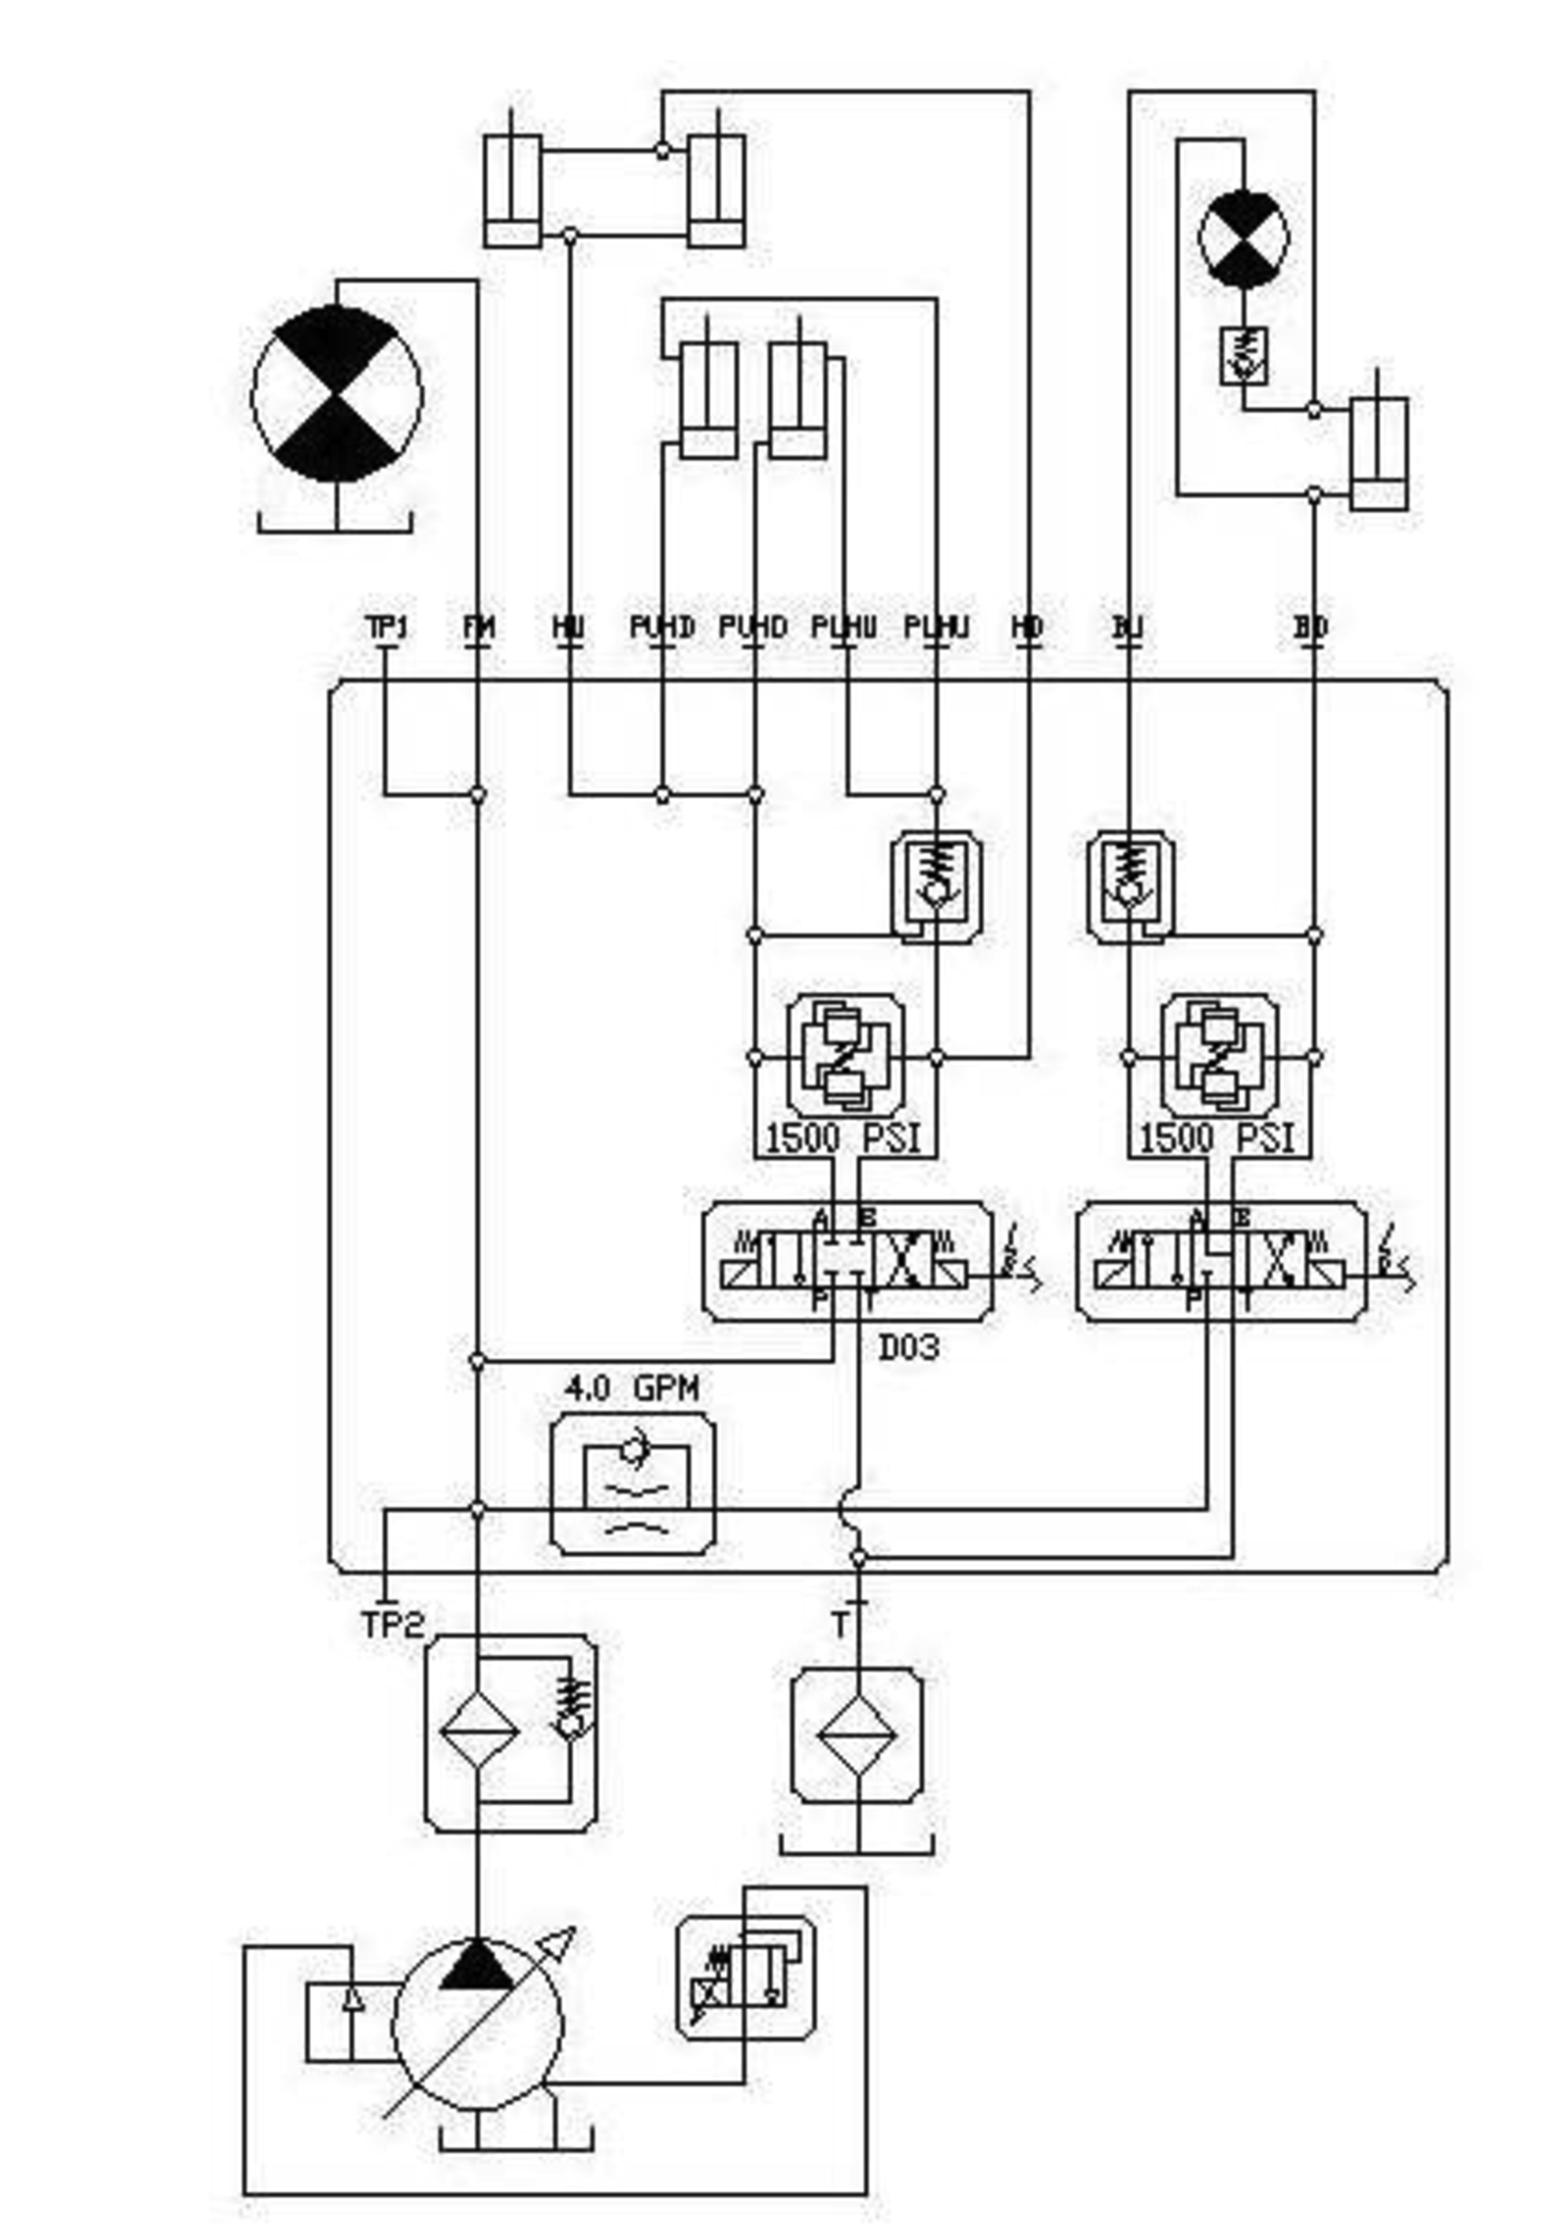 osprey hydraulic schematic rh buysweeperparts com hydraulic schematic symbols library free hydraulic schematic software